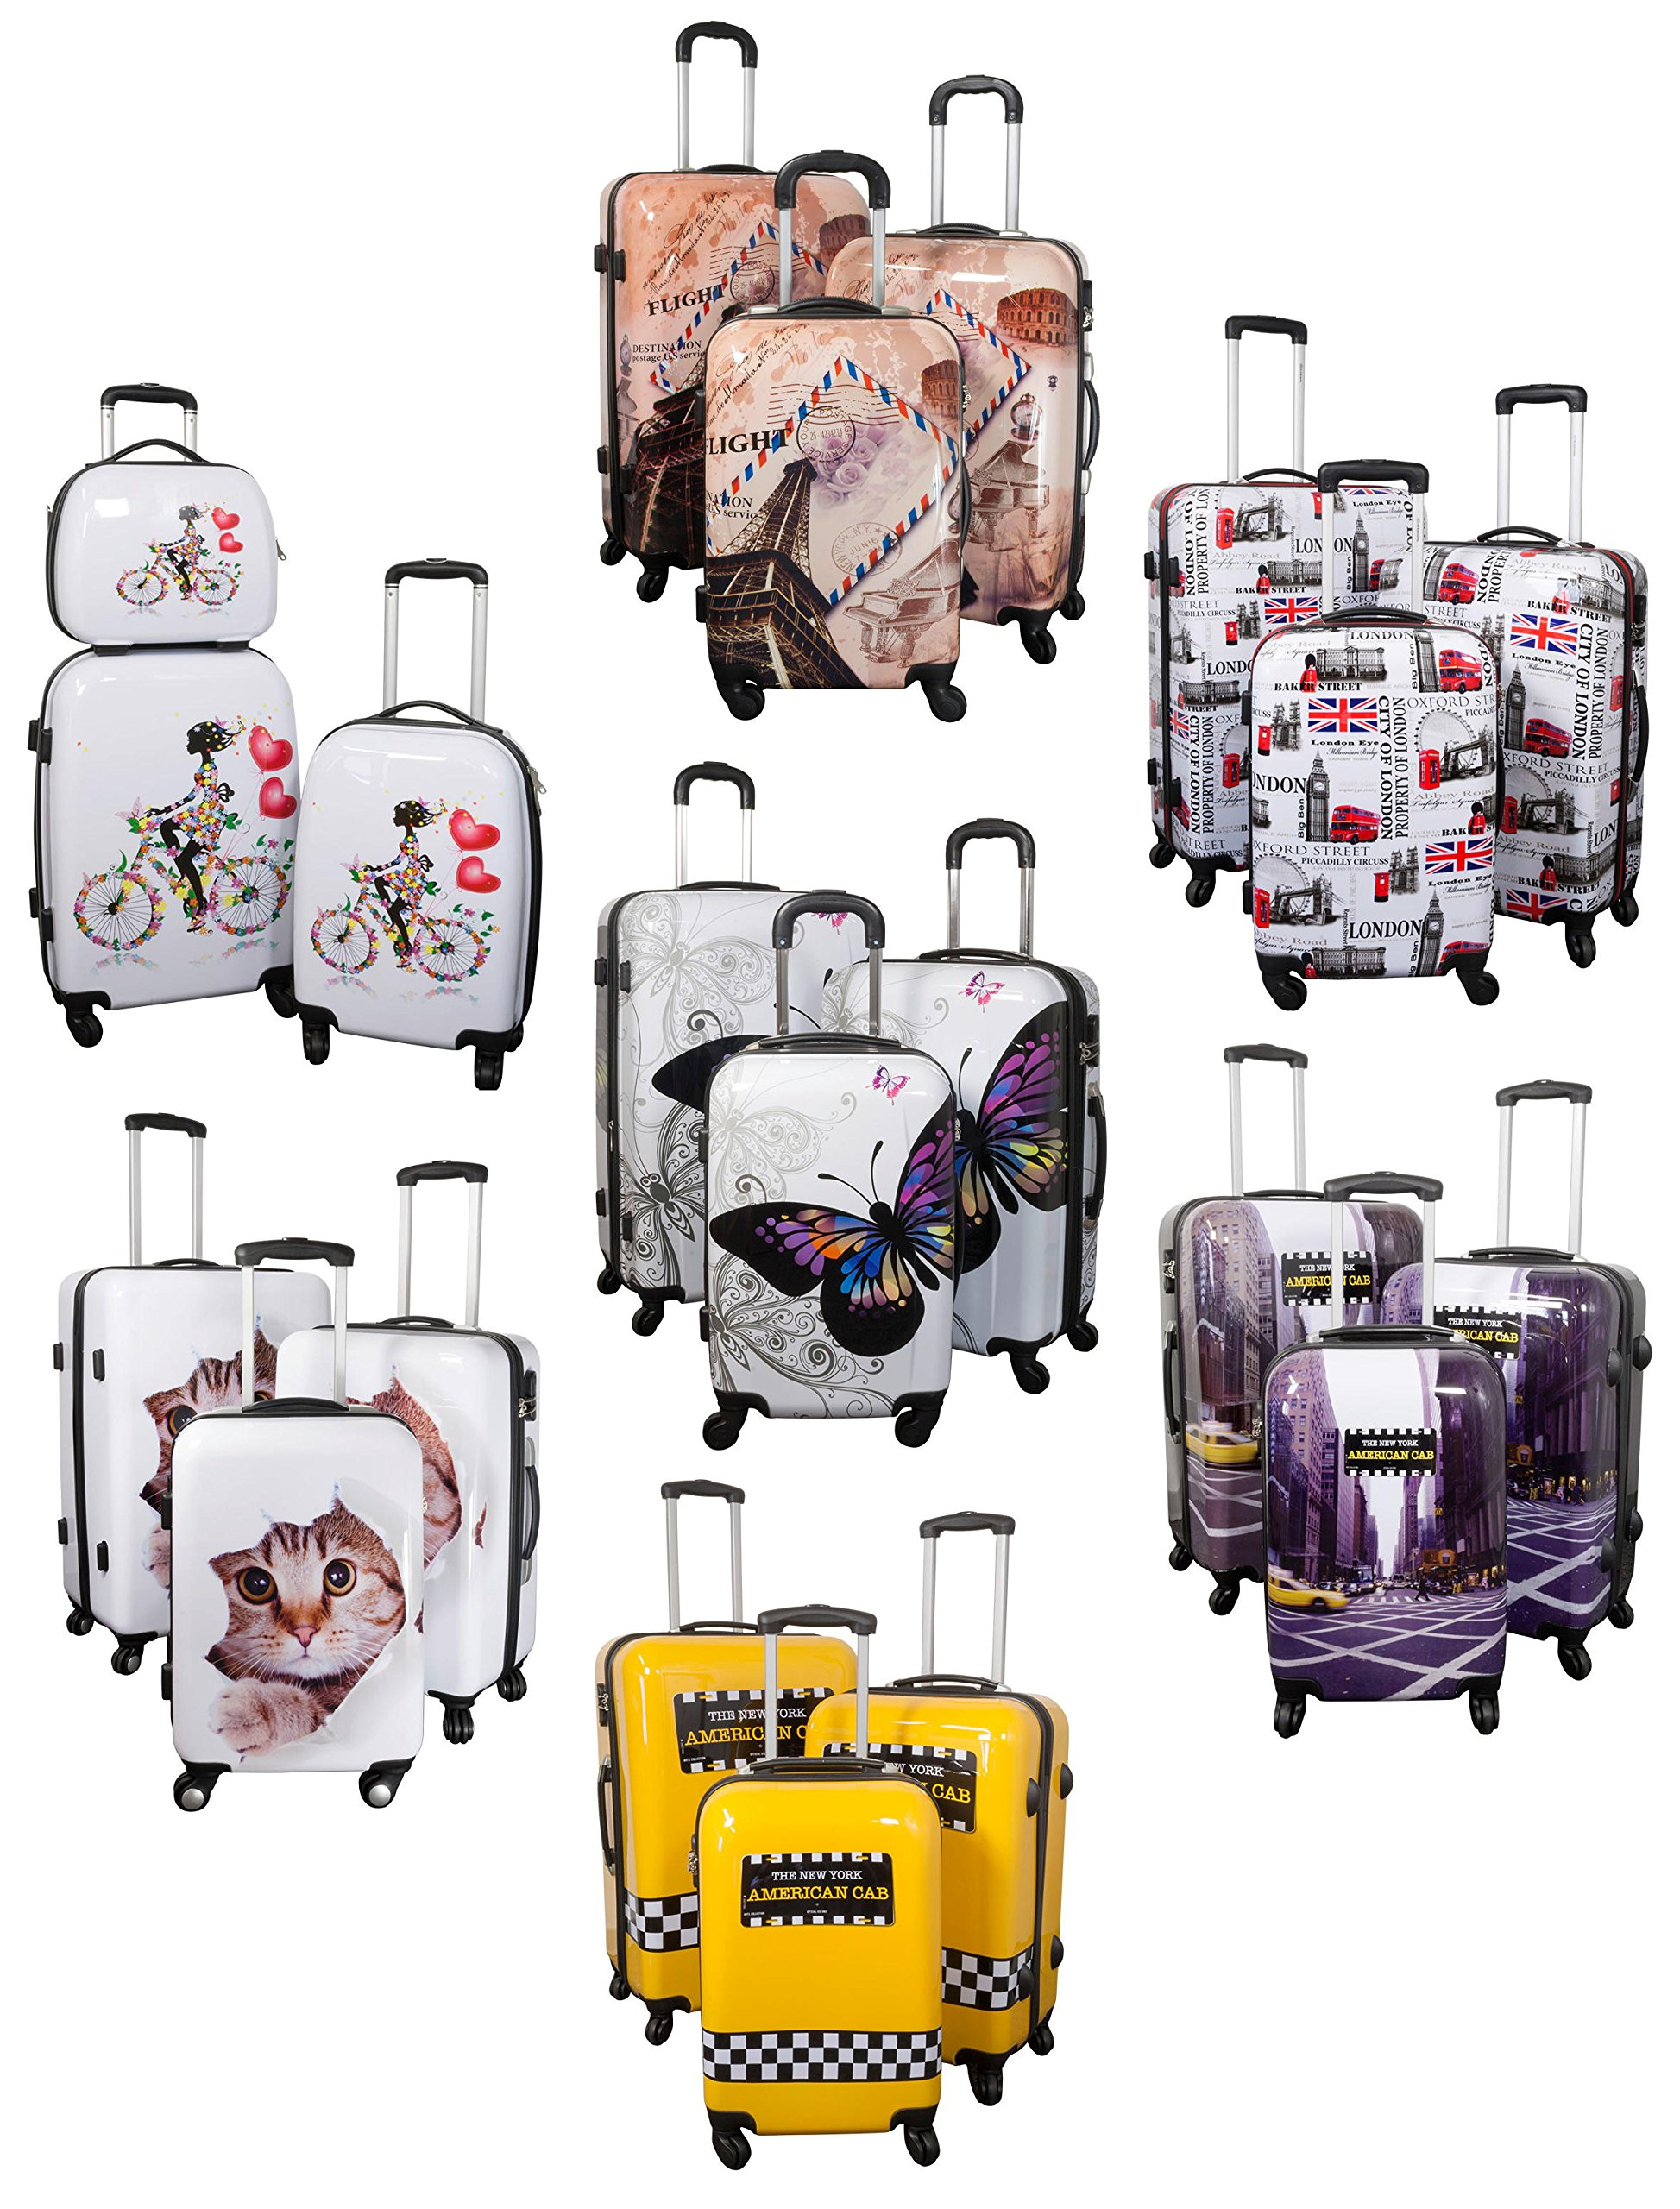 Kofferset-Gepckset-Polycarbonat-ABS-Hartschalen-Koffer-3tlg-Set-Trolley-Reisekoffer-Reisetrolley-Handgepck-Boardcase-Beautycase